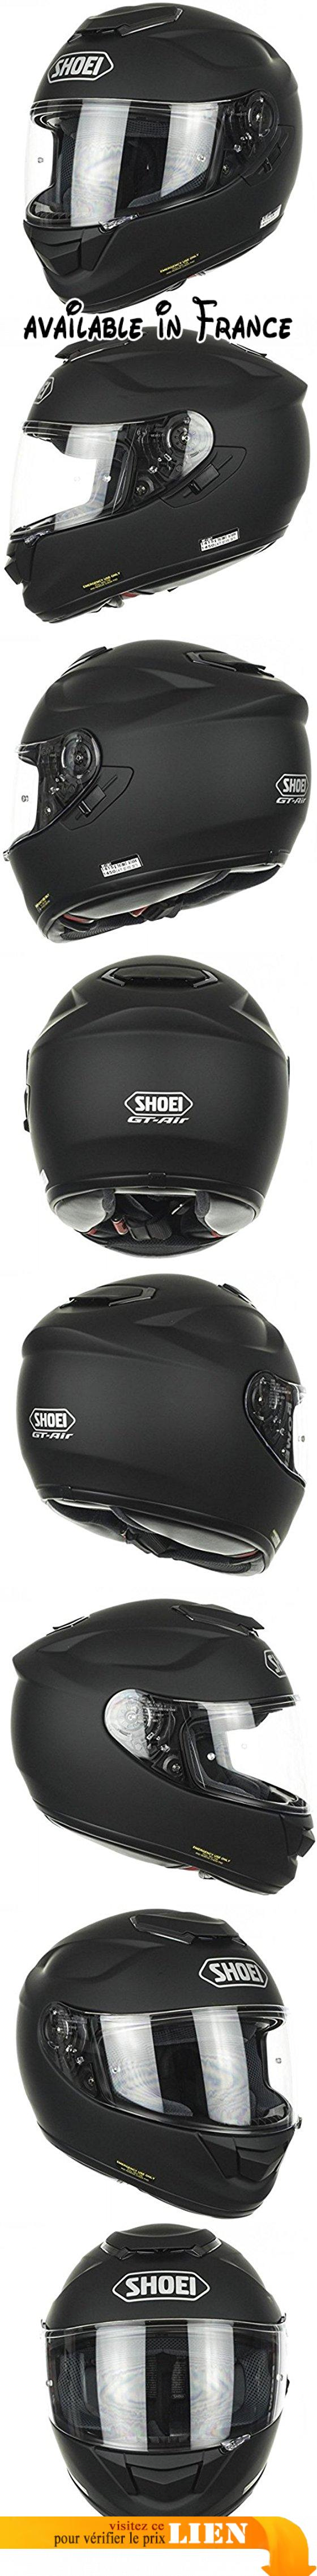 Casque De Moto Shoei Gt Air Matt Black Coque Aim Superposition De